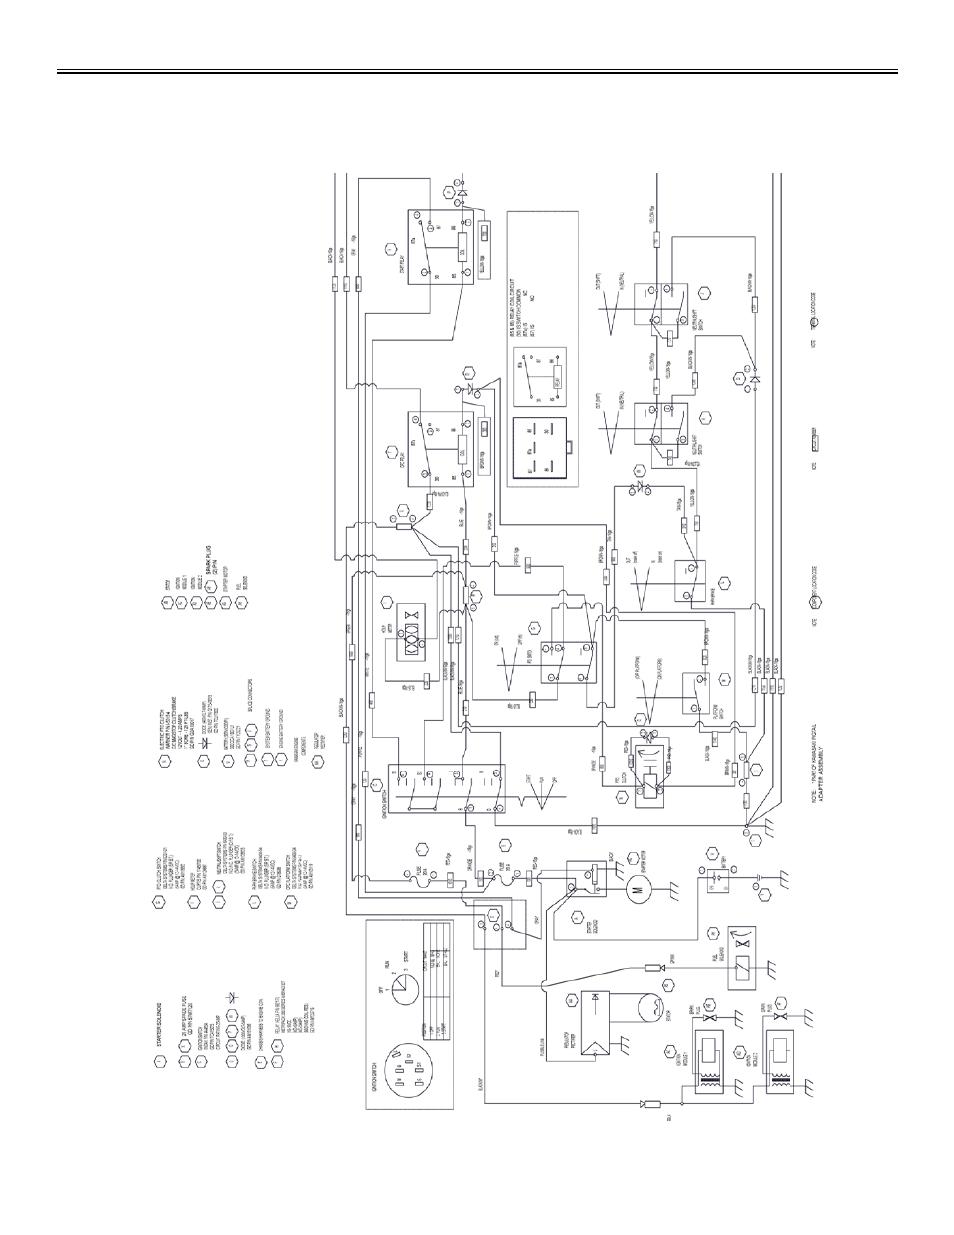 32 Great Dane Trailer Wiring Diagram